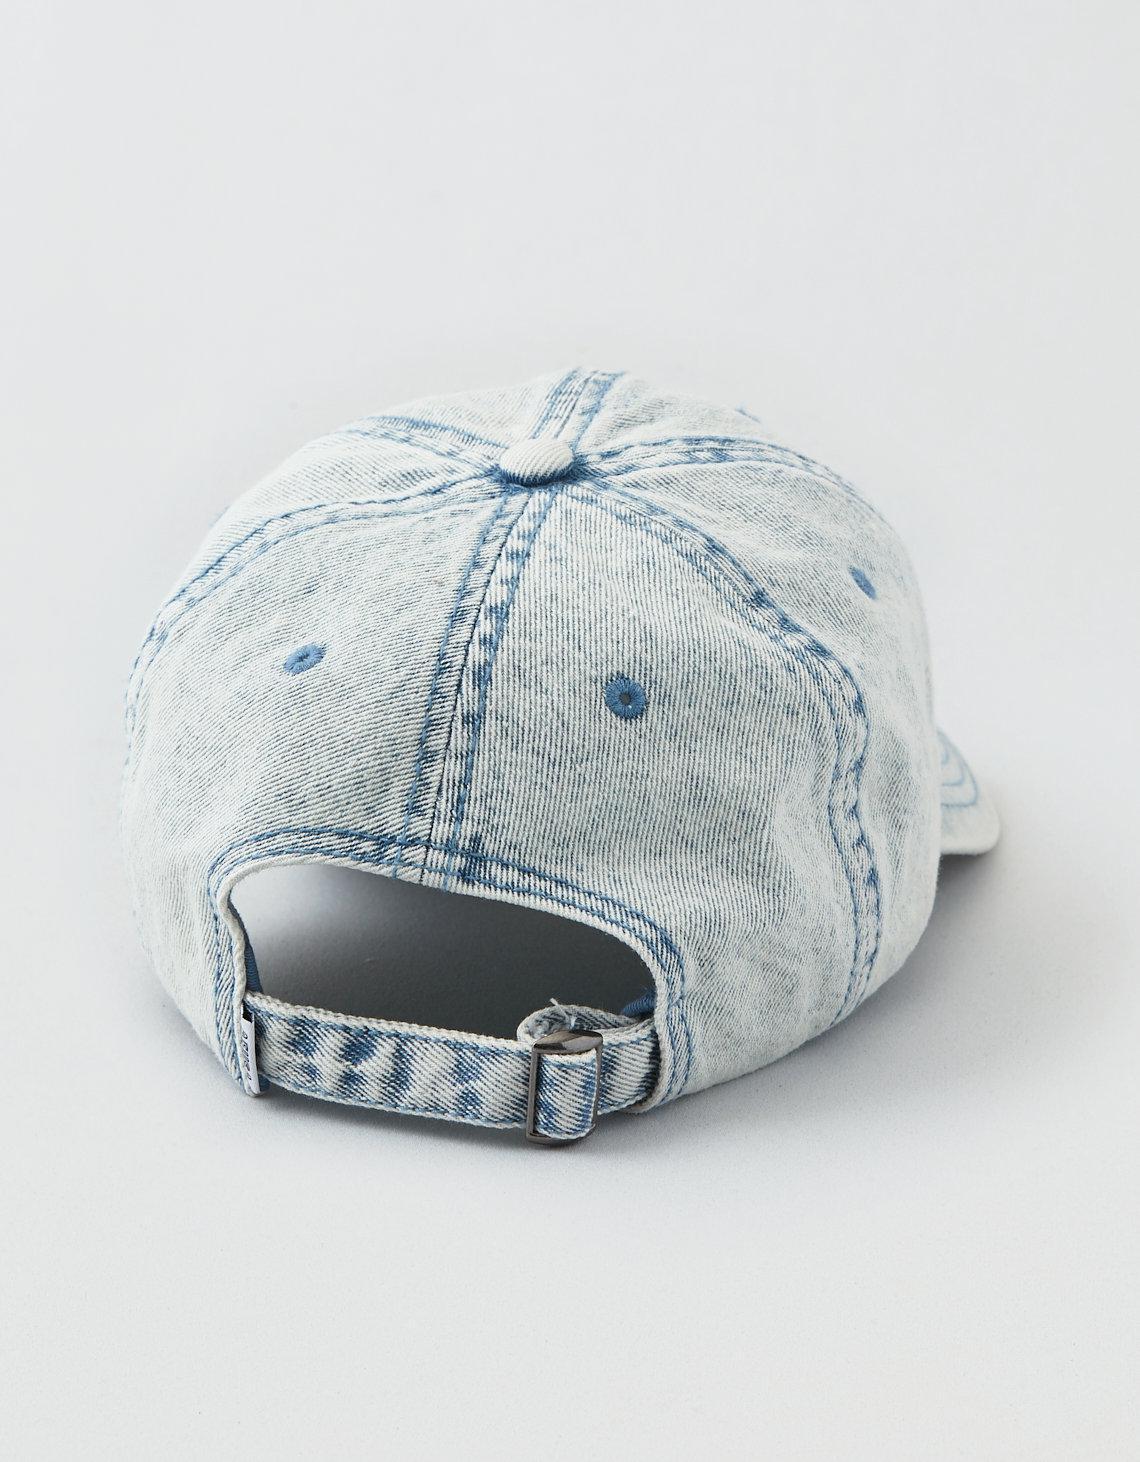 Lyst - American Eagle Ae Washed Denim Logo Hat in Blue for Men d5a3b2236178